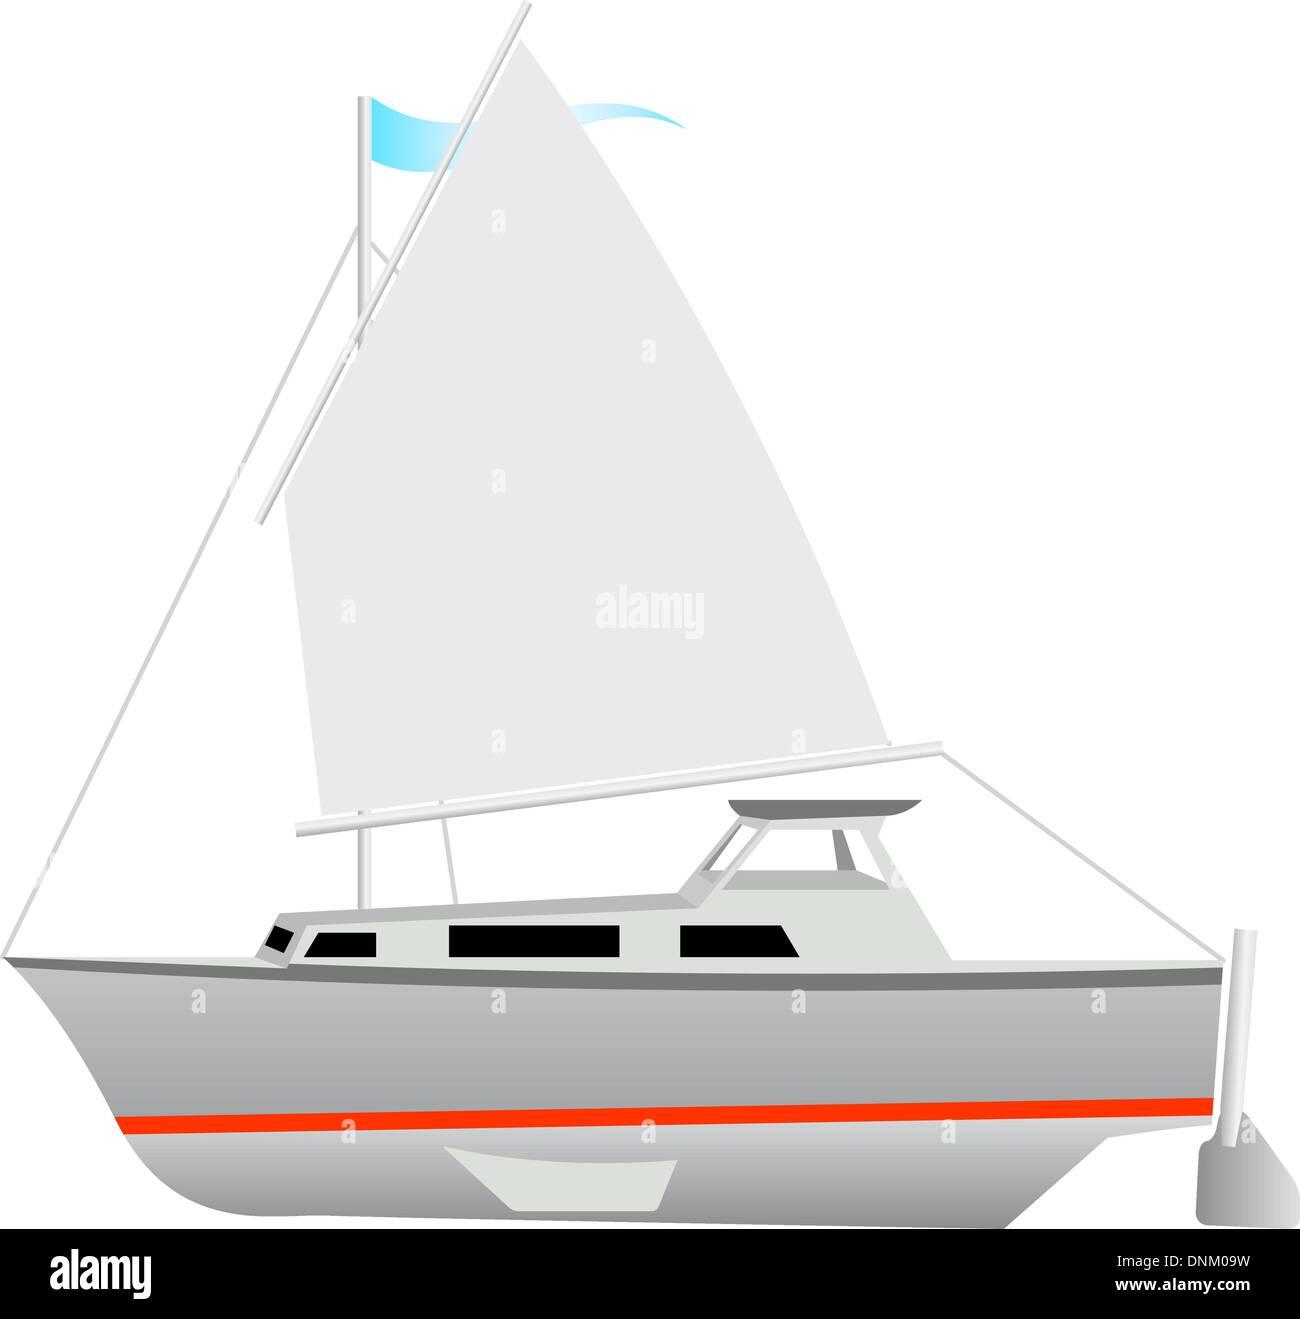 Velero flotando. Ilustración vectorial. Imagen De Stock